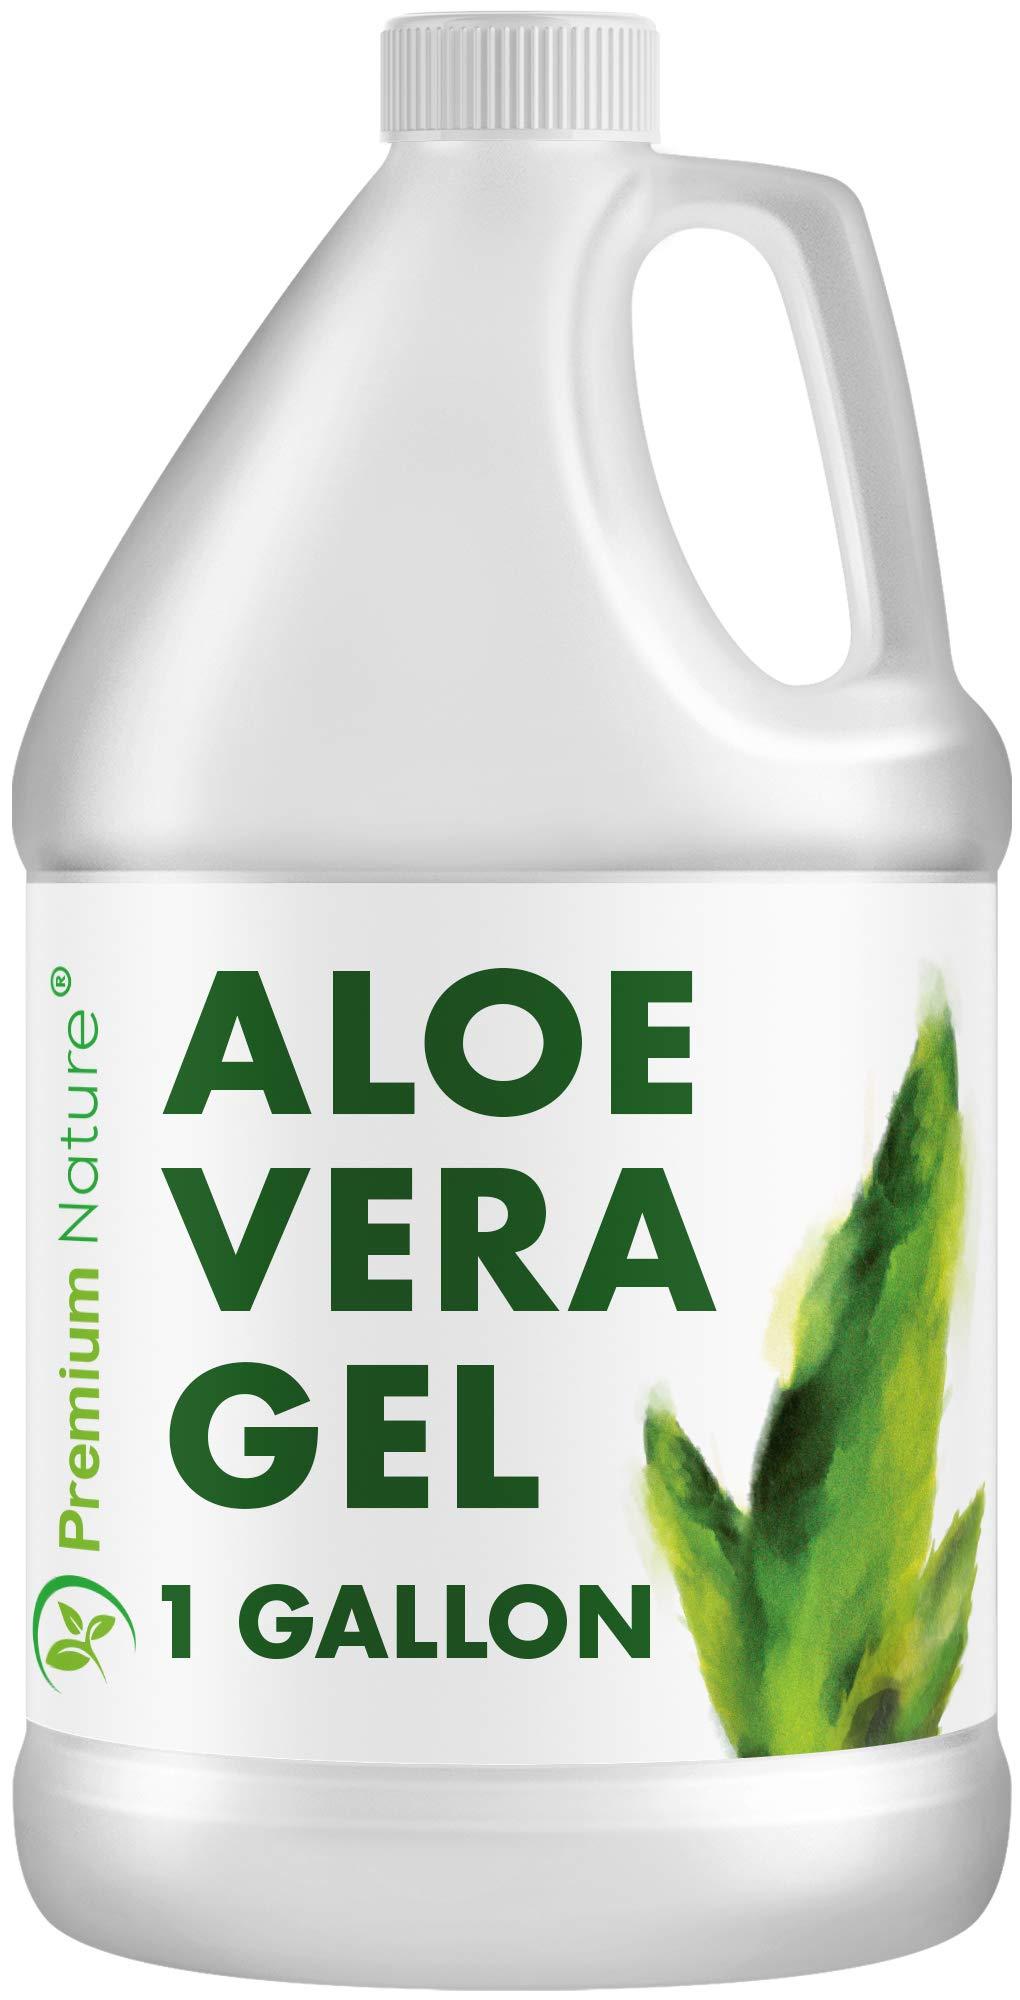 Pure Aloe Vera Gel Lotion- For Face & Dry Skin Psoriasis Eczema Treatment Cold Sore Scar After Bug Bite Sunburn Relief Rash Razor Bump DIY Body Lotion Skincare Moisturizer 1 Gallon